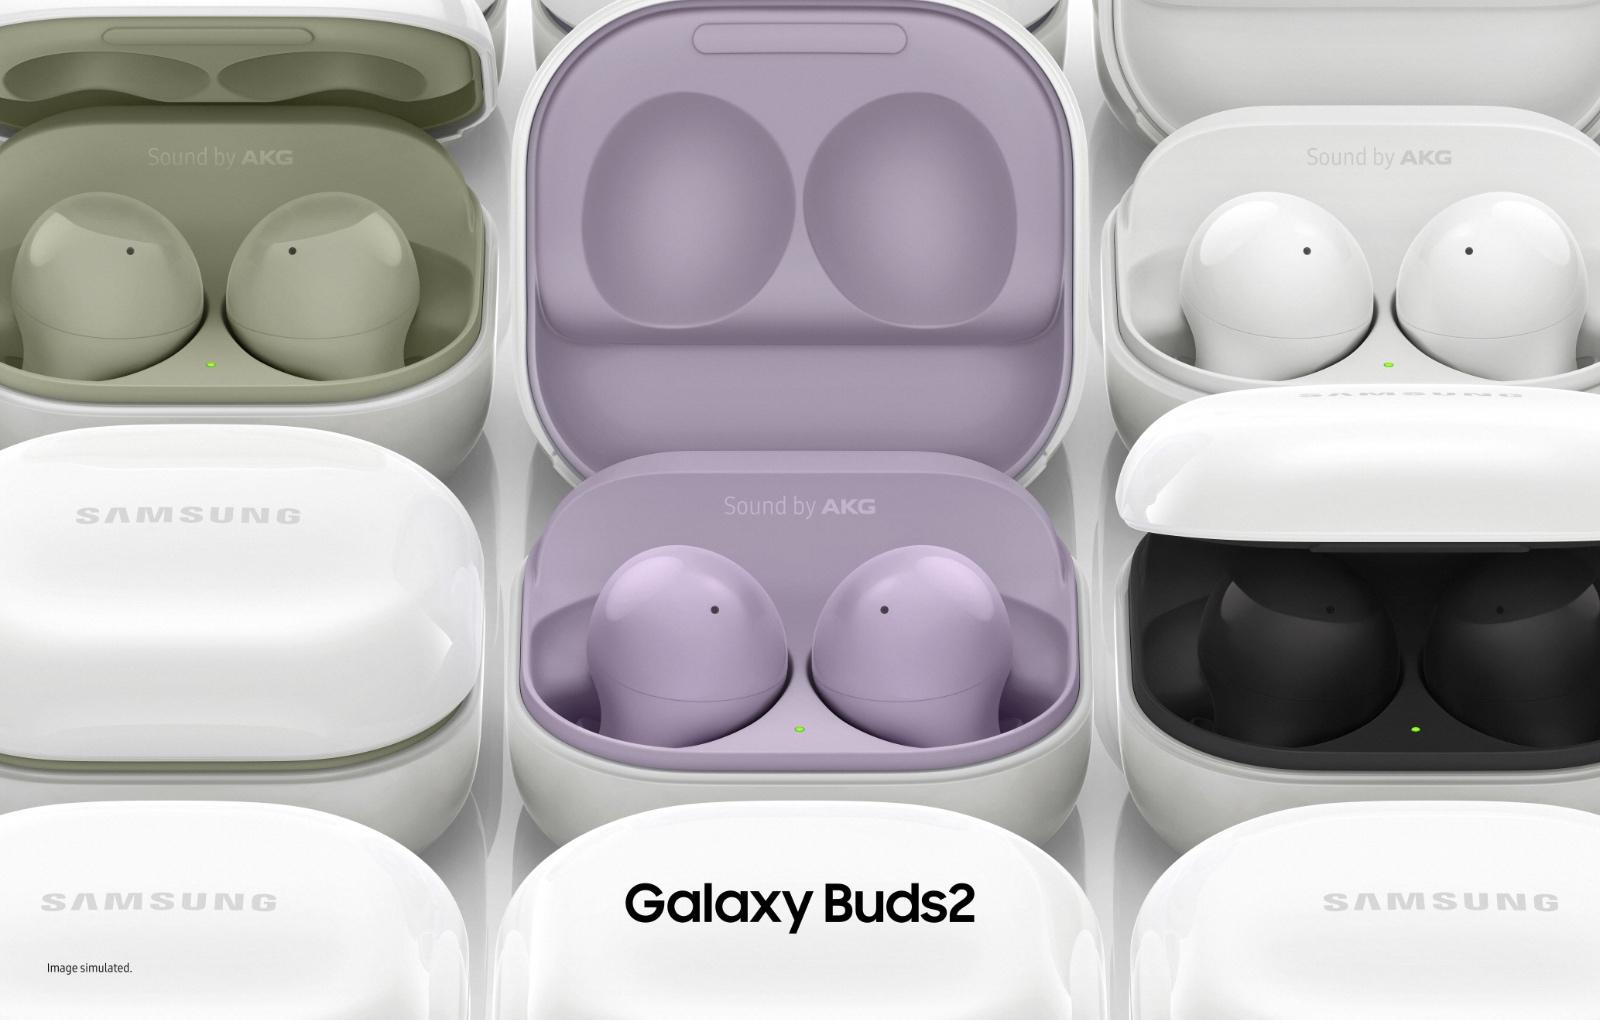 The new Samsung Galaxy Buds2. (Image source: Samsung)